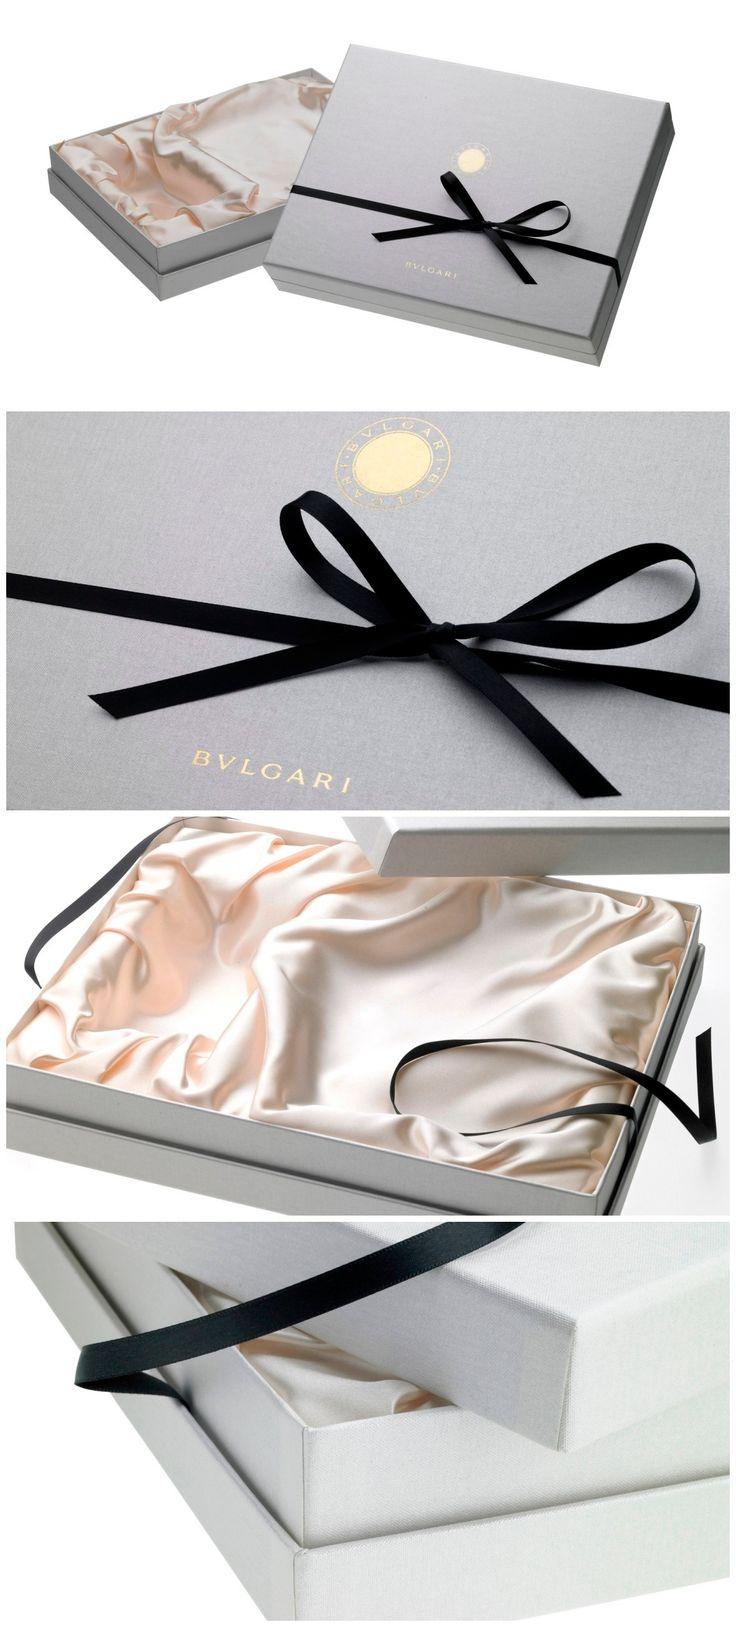 BVLGARI- Taylor Box Company-  Luxury invitation commemorating the release of a new fragrance for Bvlgari   #design #box #packaging #fragrance #perfume #bvlgari #bulgari